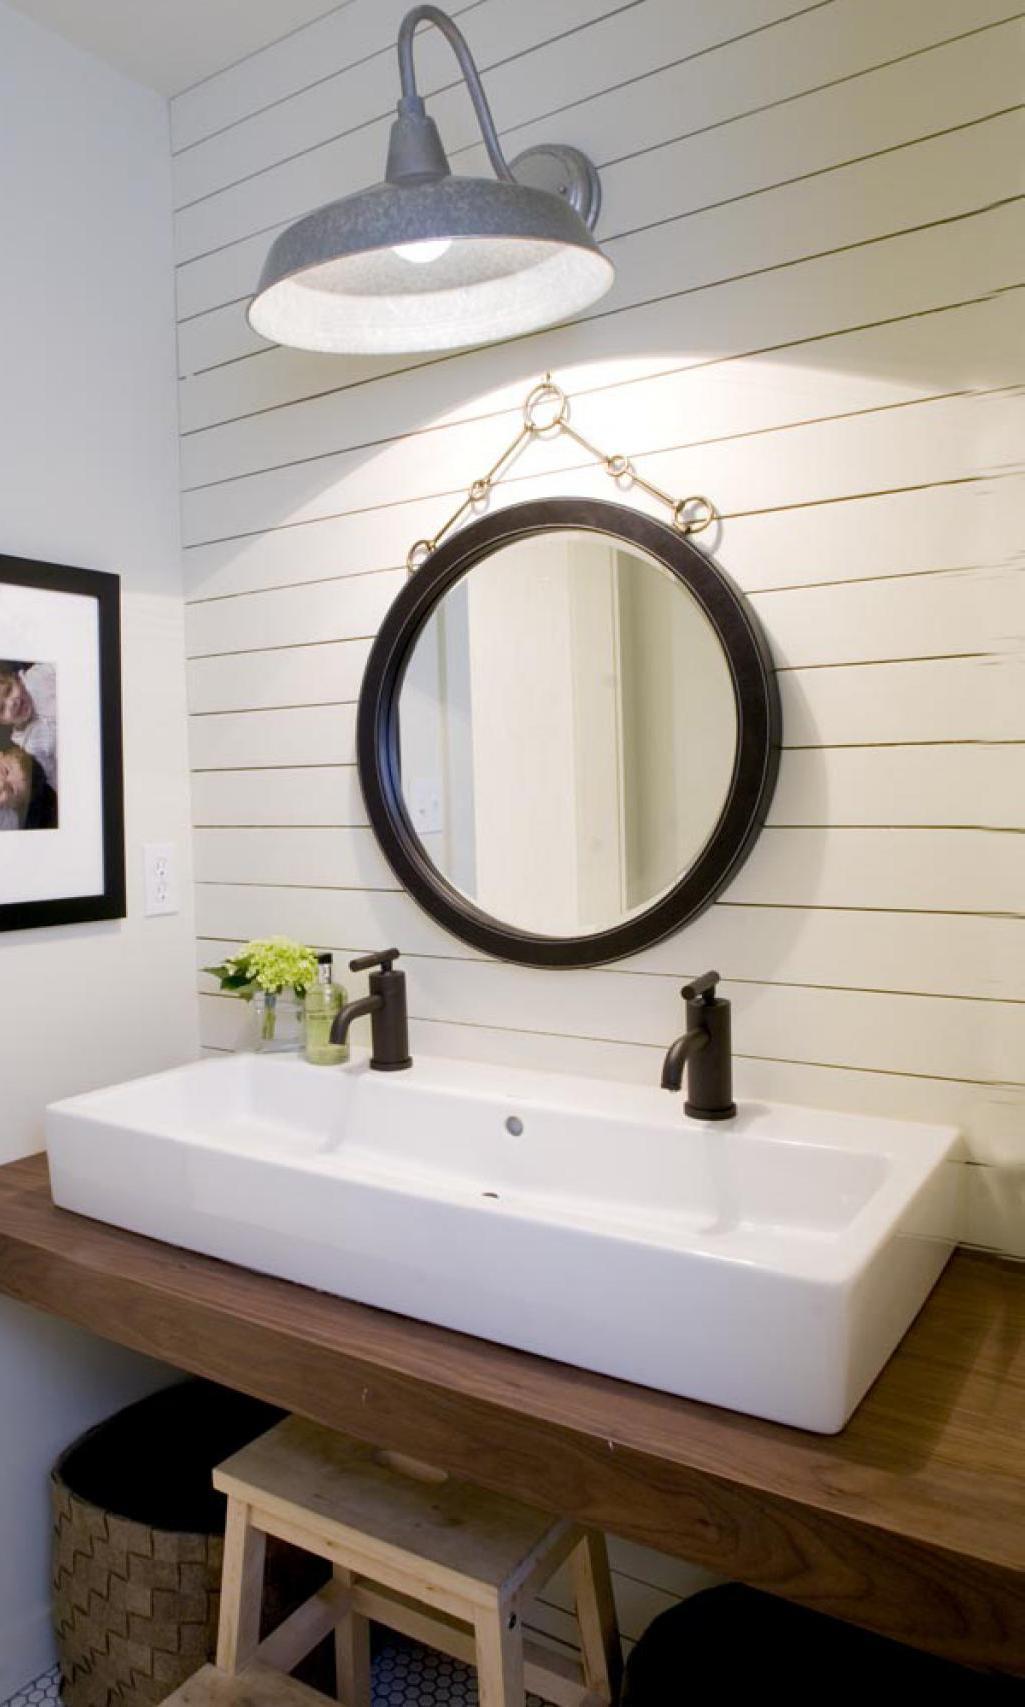 Creating A Beautiful Bathroom With Farmhouse Design on Bathroom Ideas Modern Farmhouse  id=68457